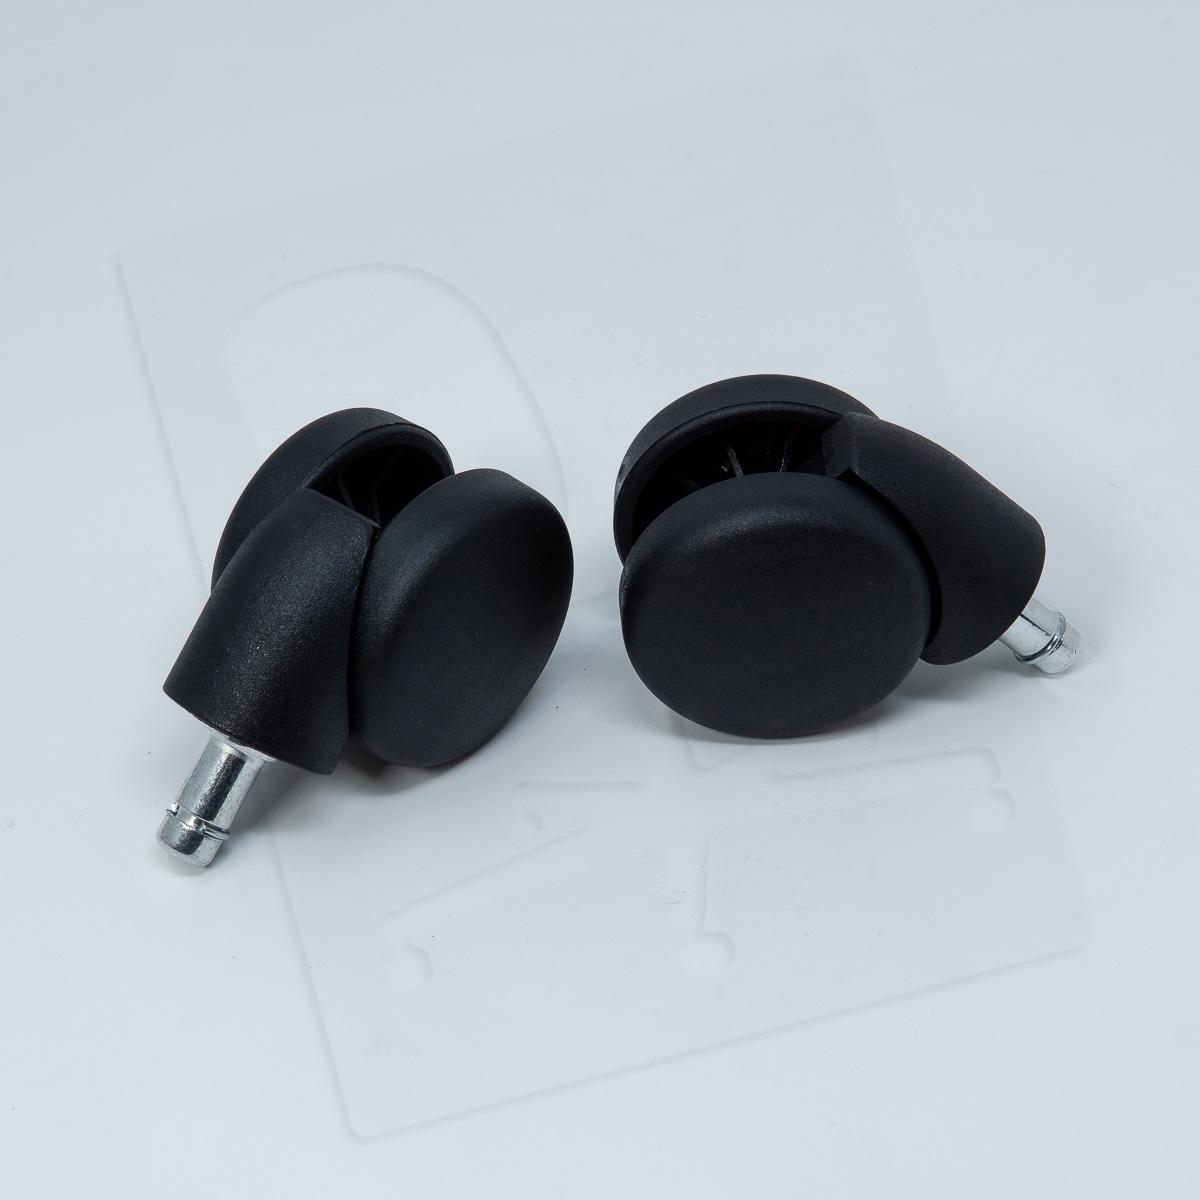 Crandall Office Furniture Aftermarket Steelcase 458 Sensor Soft Floor Casters 0003